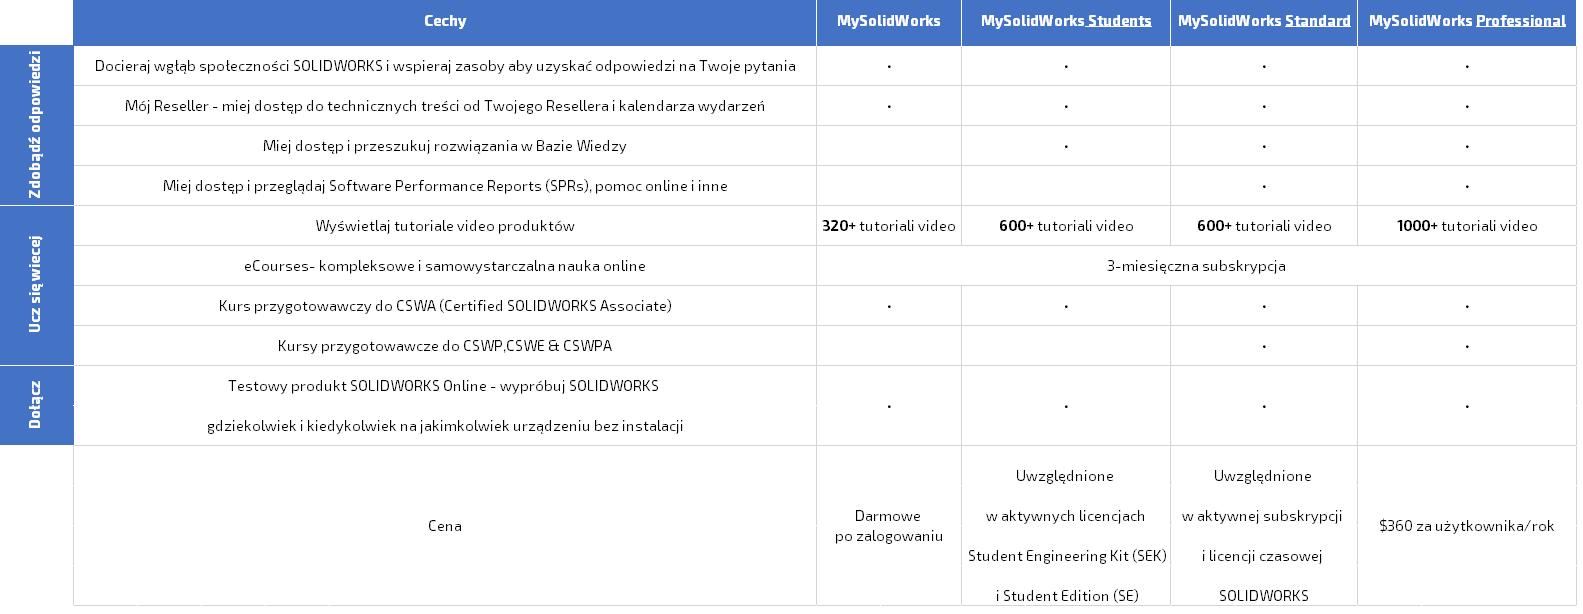 Subskrypcja MySolidWorks Professional